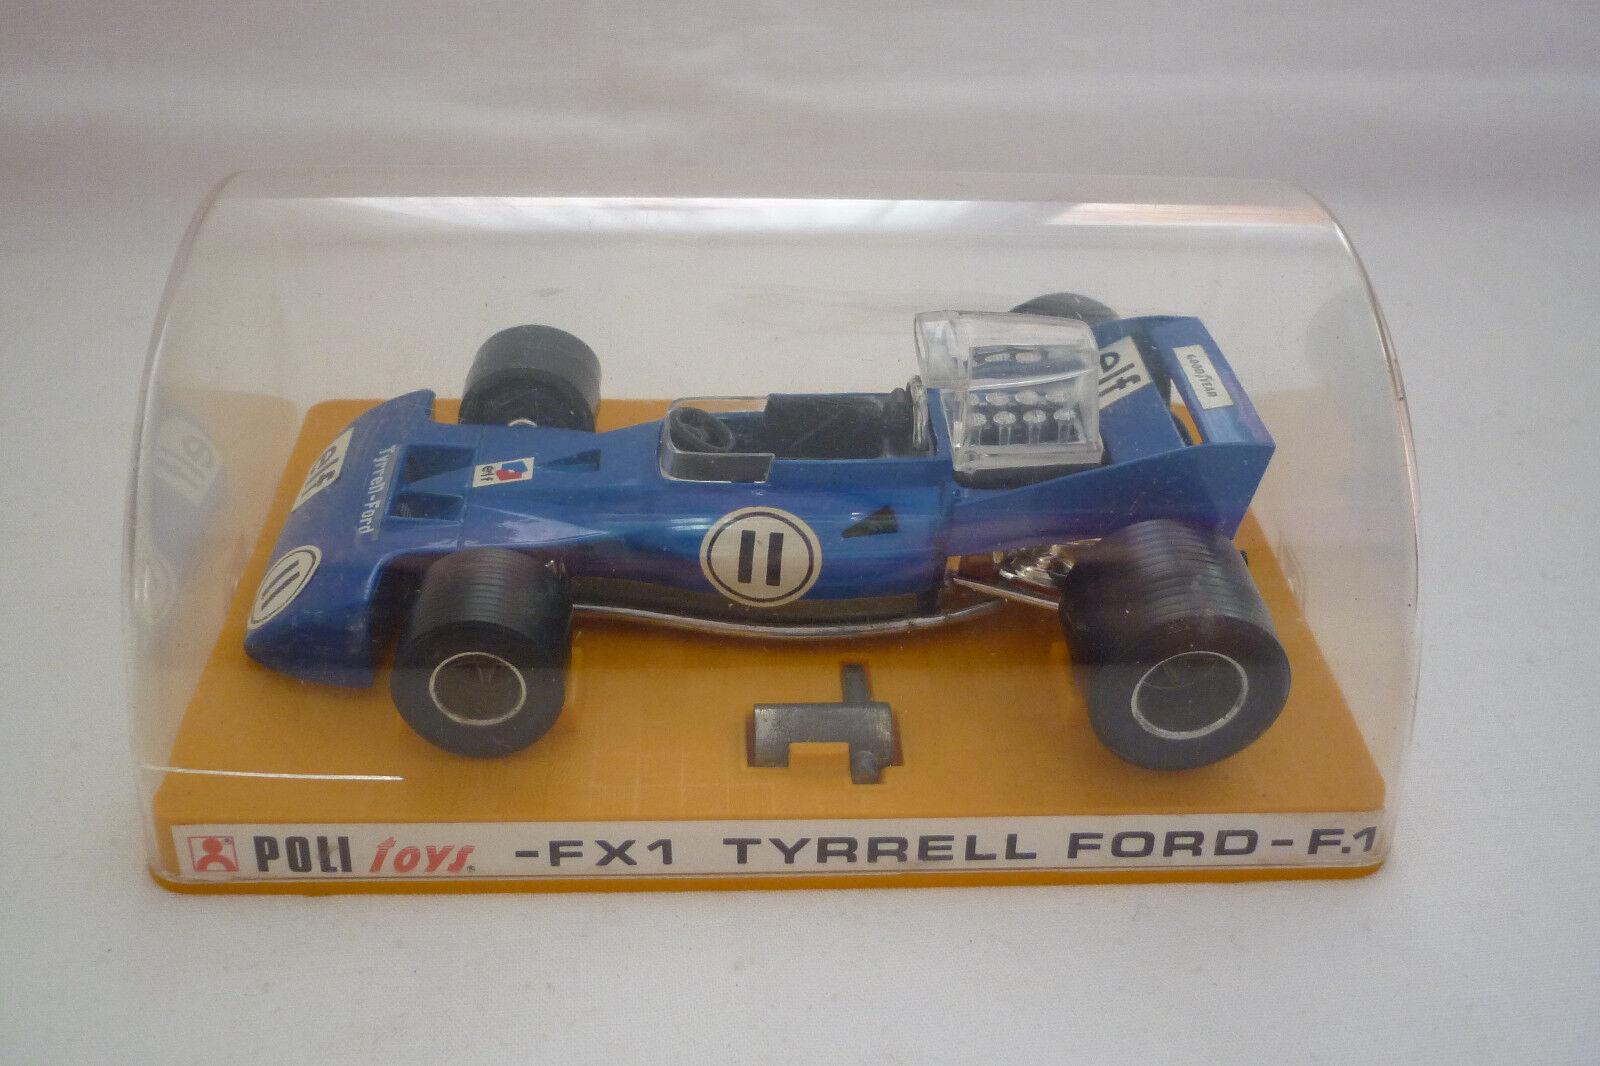 POLITOYS - Vintage Metal Model -tyrrell Ford - For 1 - 1 25 - (Poli 23)